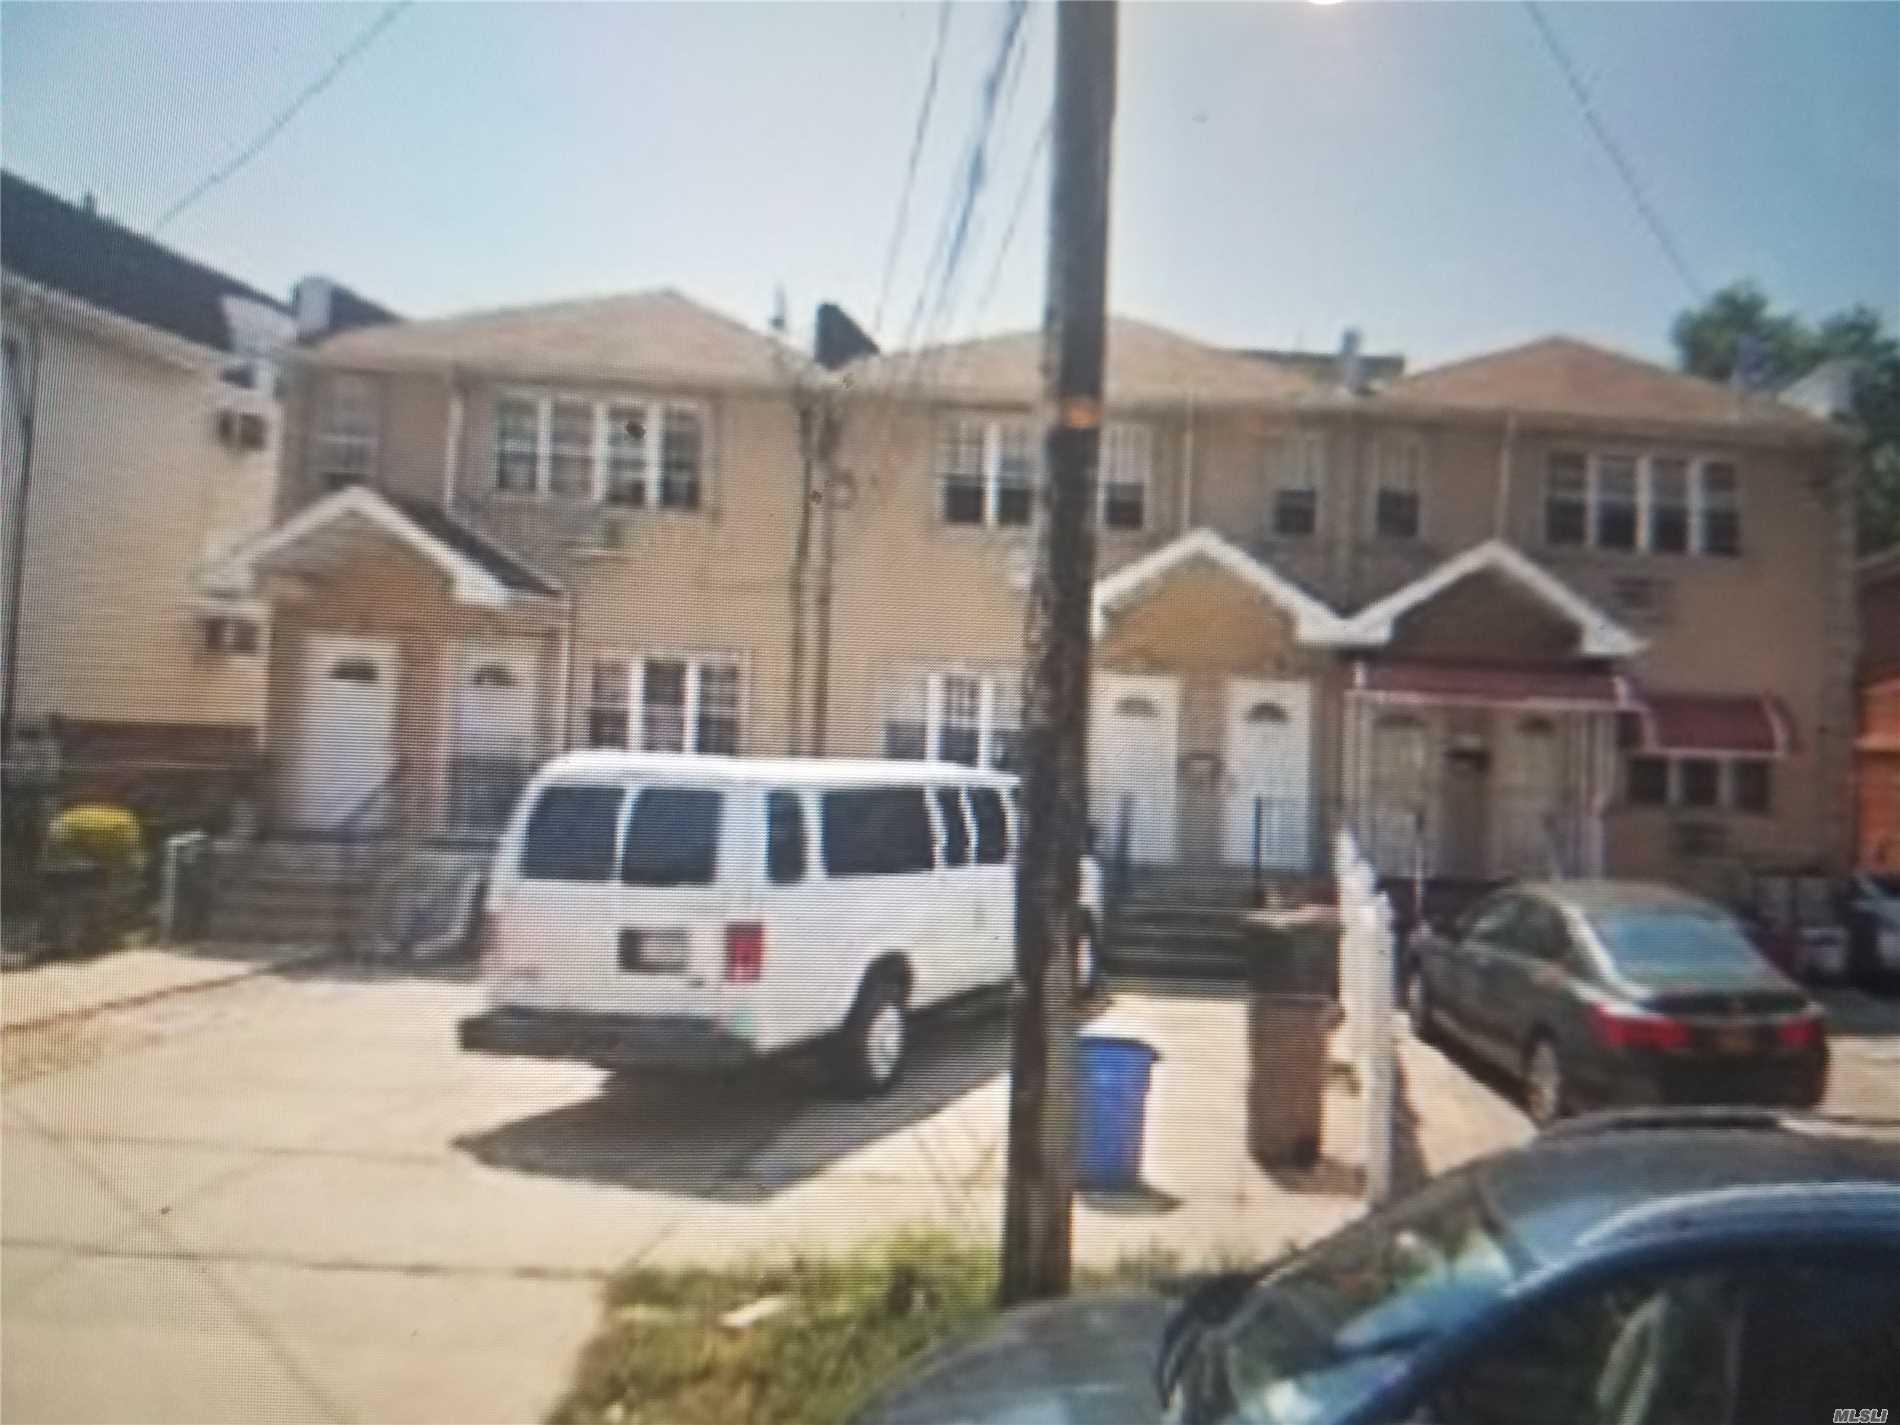 Property for sale at 29-31 Beach Channel Drive, Far Rockaway NY 11691, Far Rockaway,  New York 11691